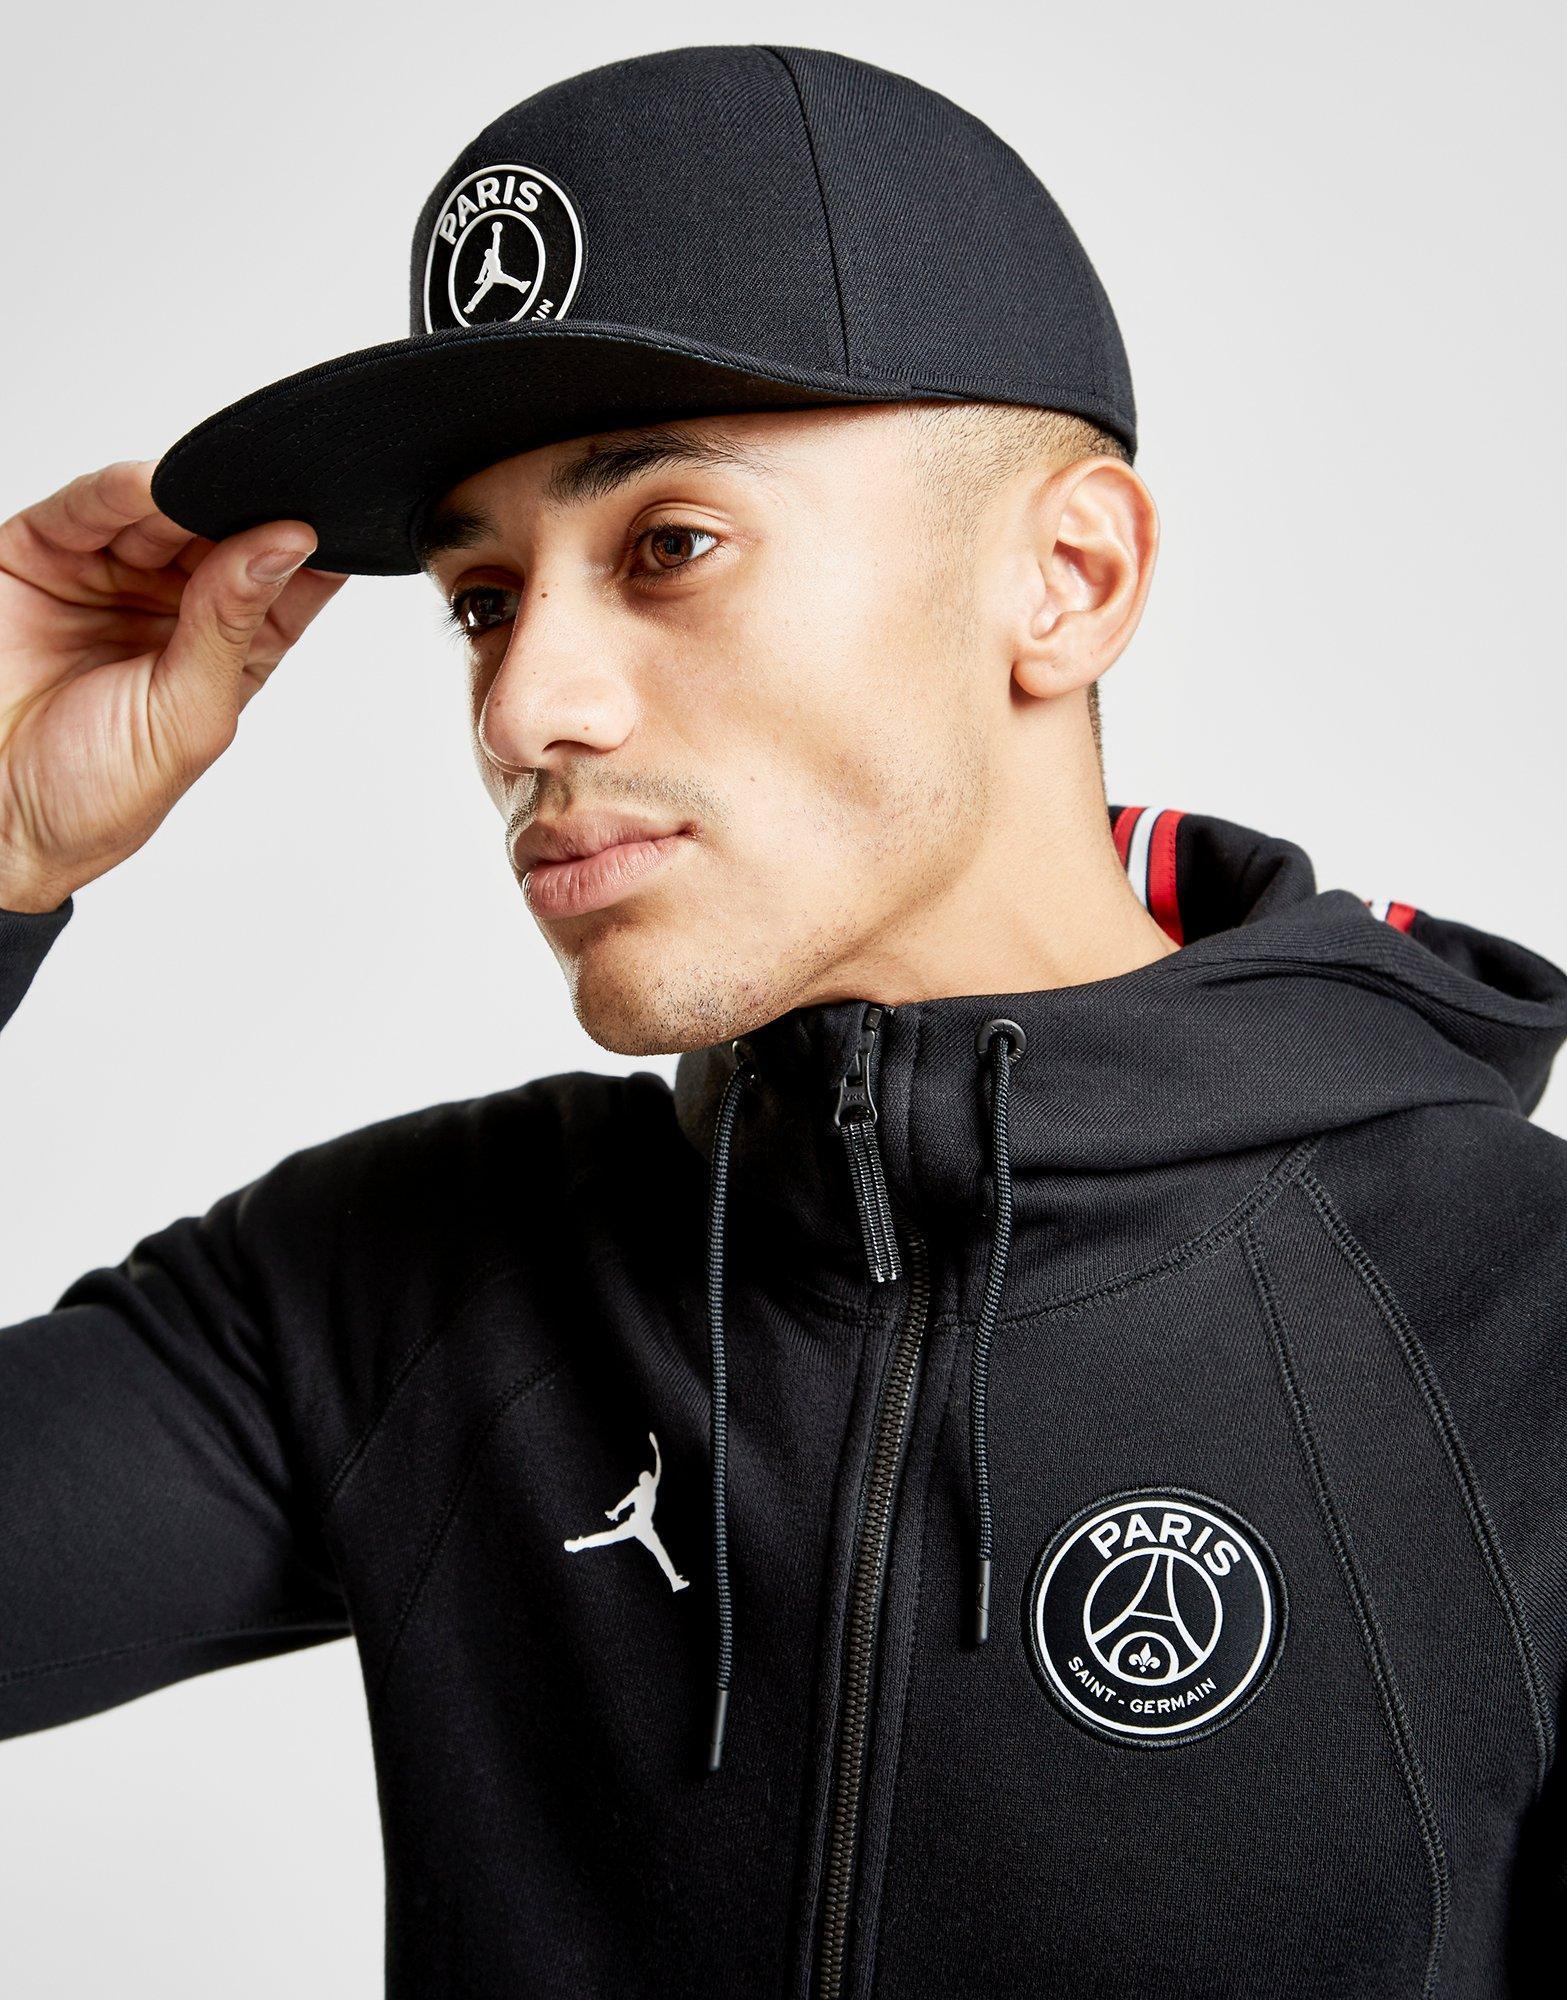 6c7bace6277441 Lyst - Nike X Paris Saint Germain Pro Cap in Black for Men